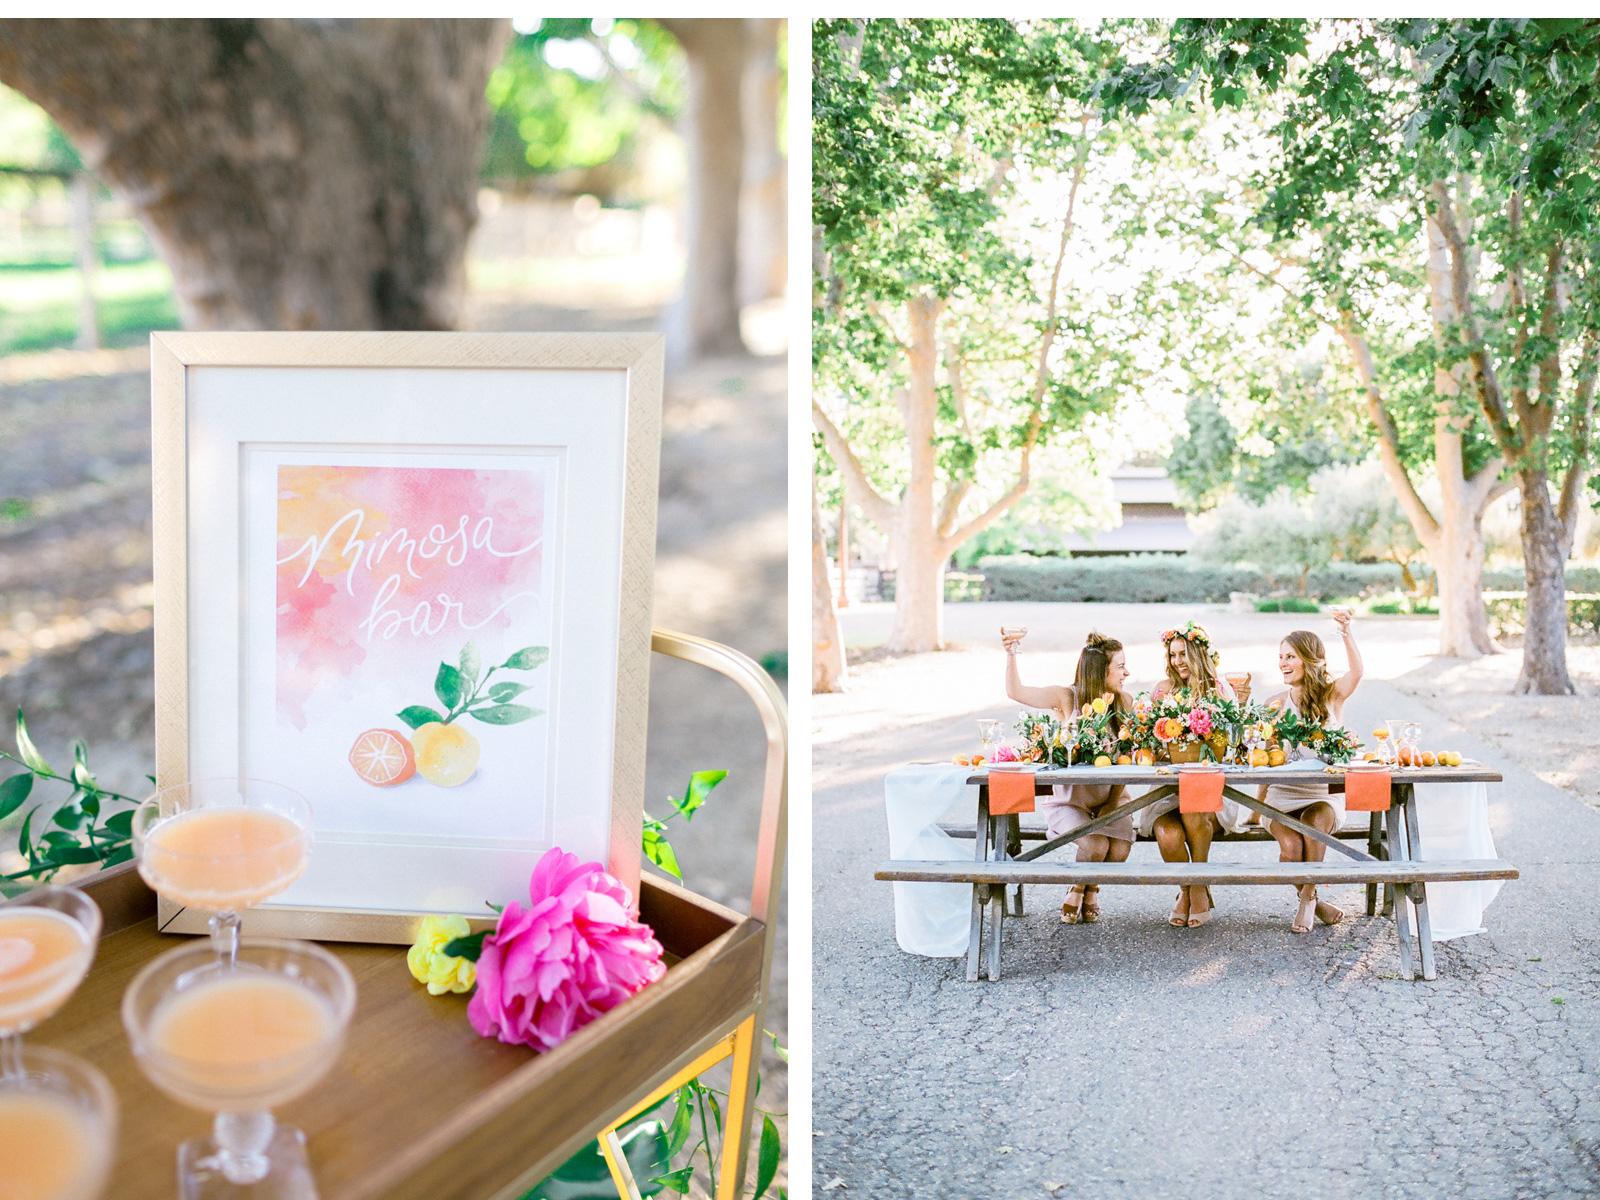 Whispering-Rose-Ranch-Wedding-Natalie-Schutt-Fine-Art-Photography-Style-Me-Pretty_03.jpg